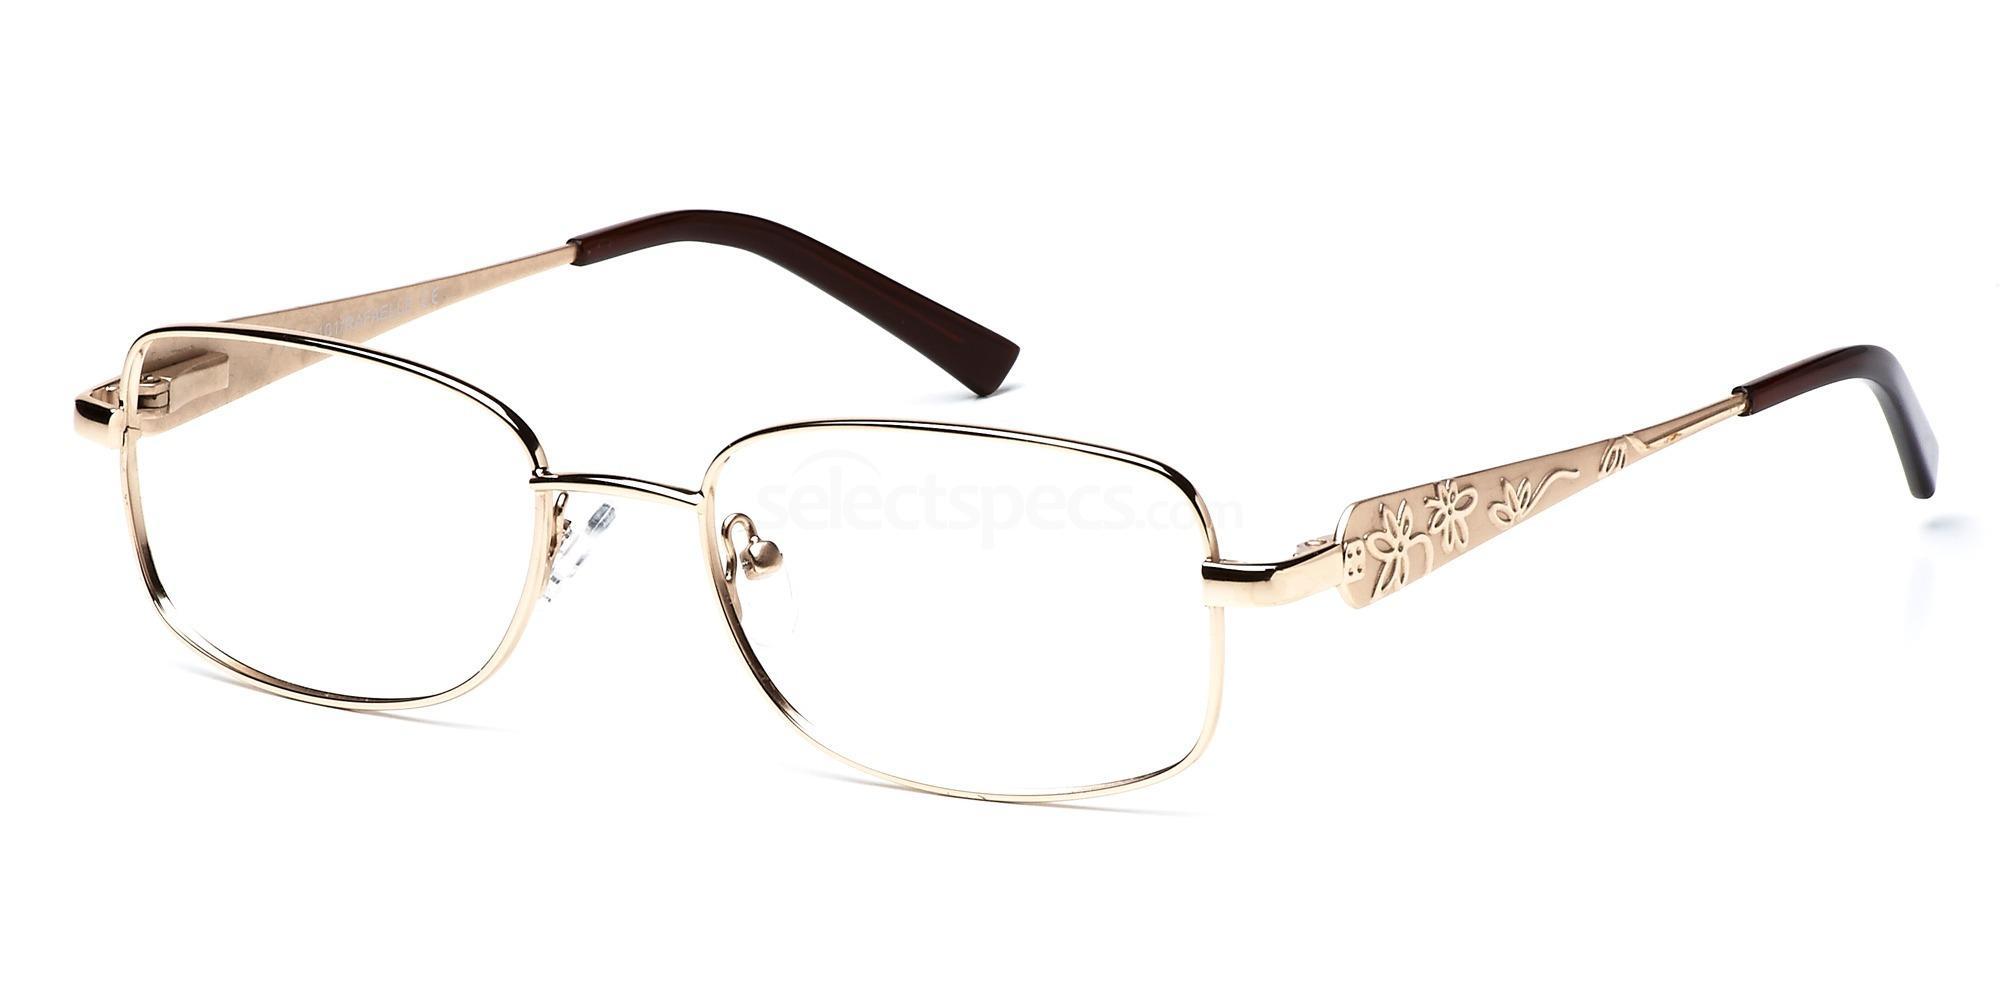 C1 RAF101 Glasses, Rafaelle